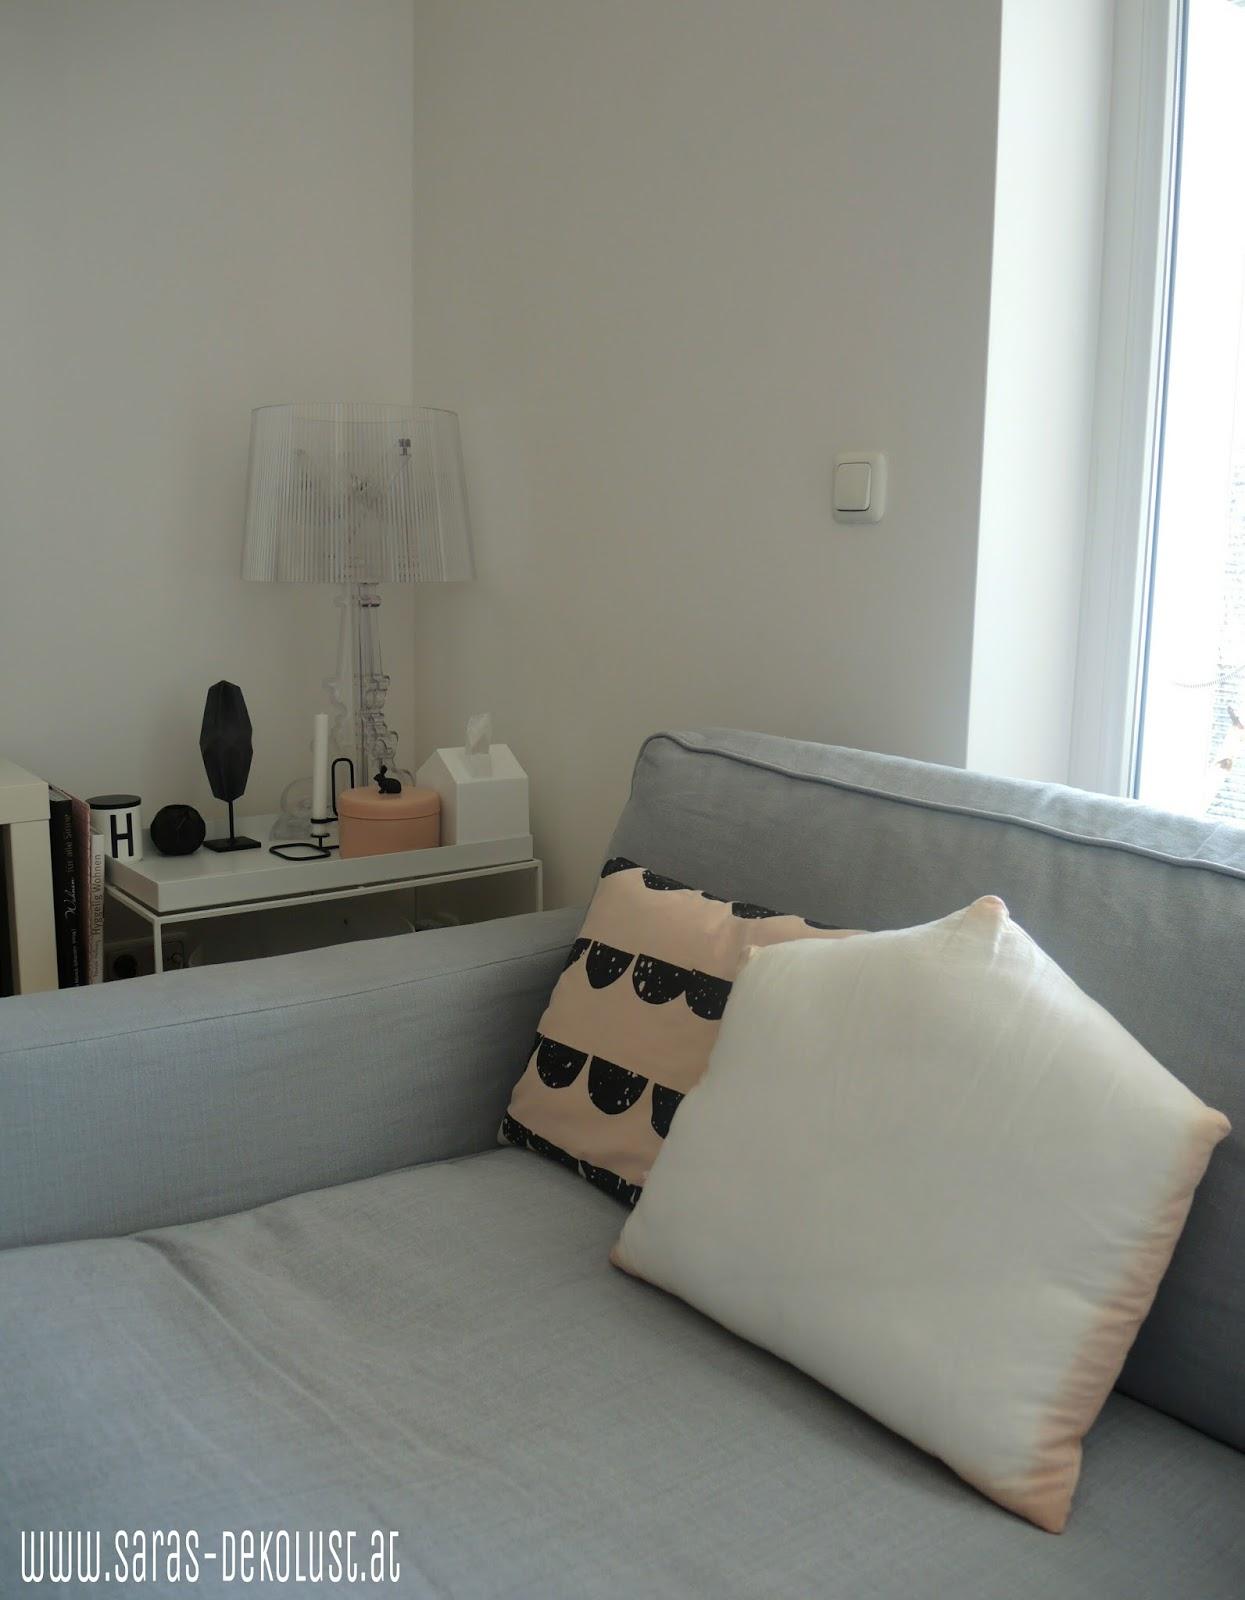 saras dekolust diy kissen und origami objekt. Black Bedroom Furniture Sets. Home Design Ideas